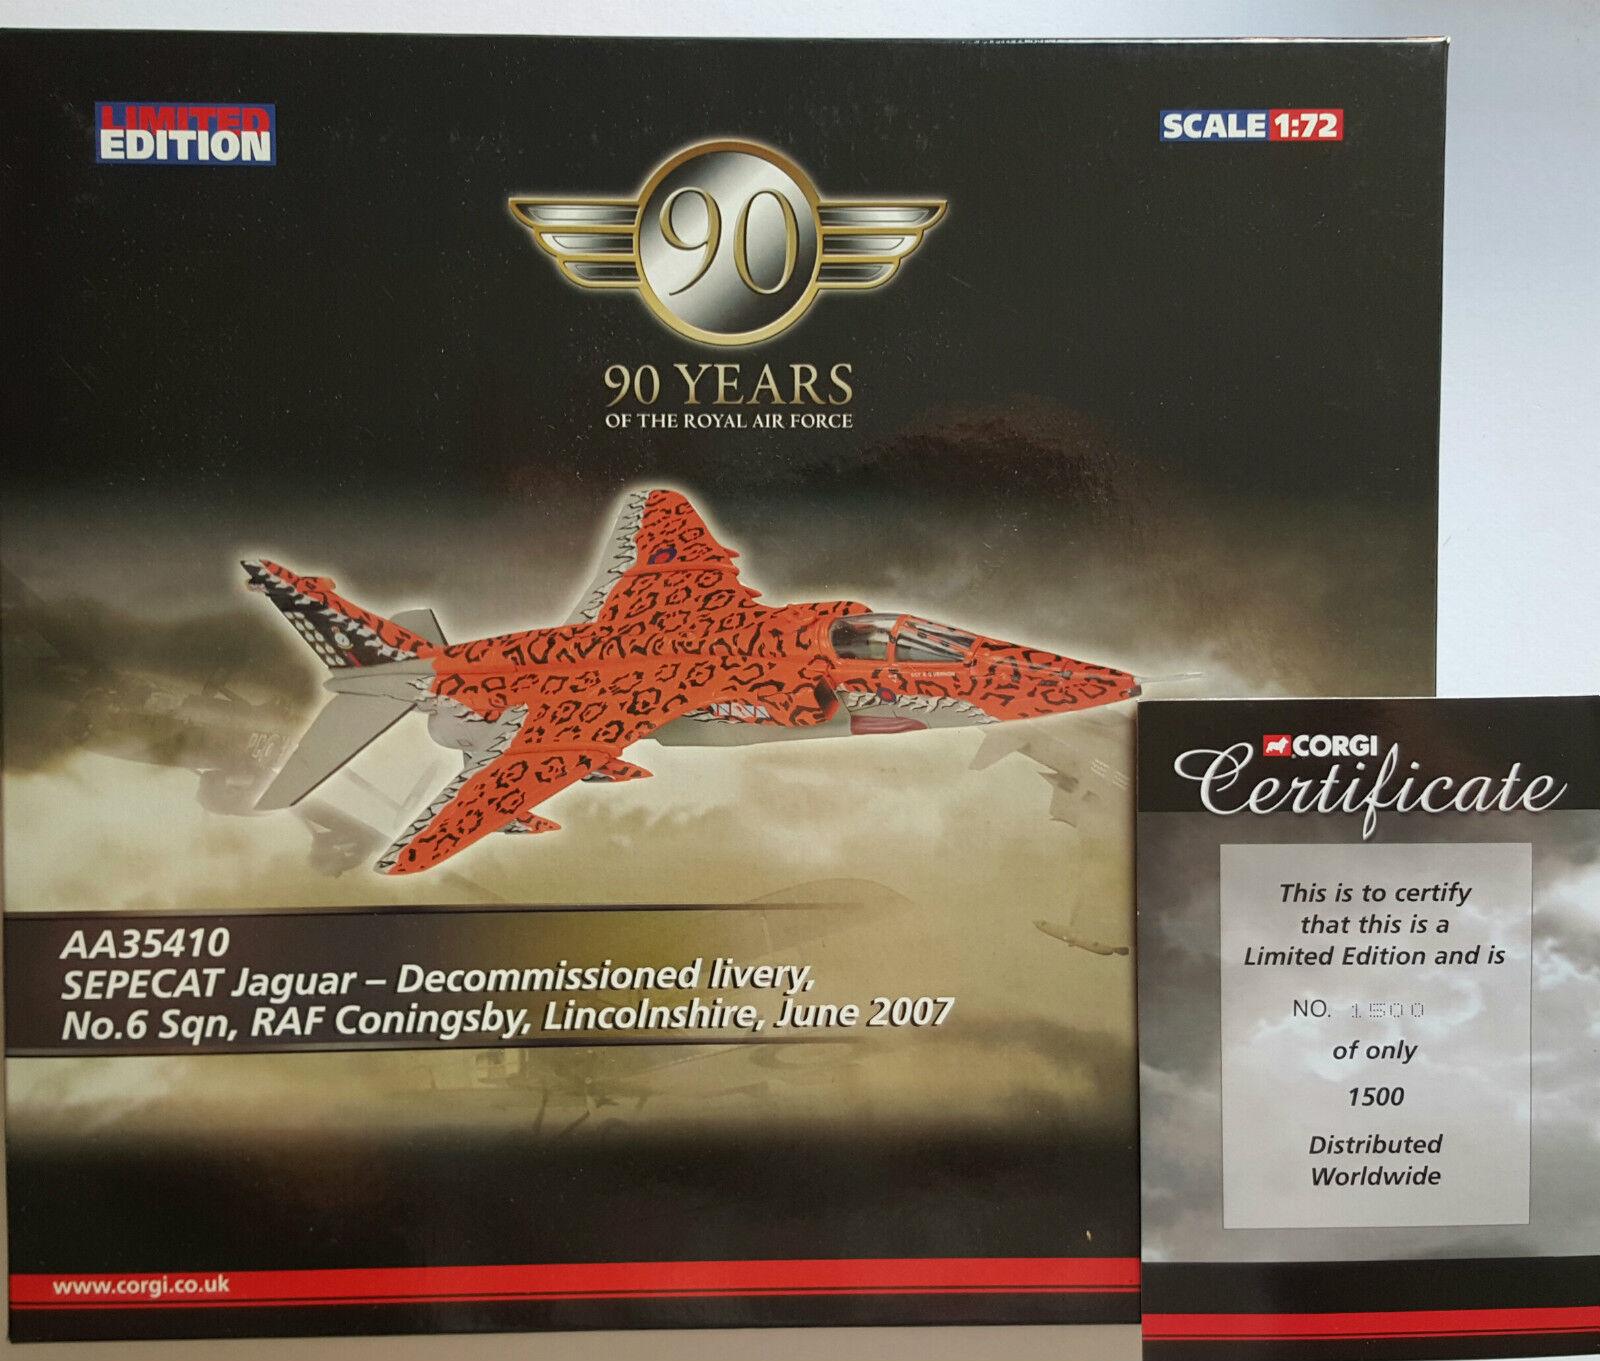 Corgi Aviation Sepecat Jaguar Decommissioned AA35410 Certificate No 1500 of 1500